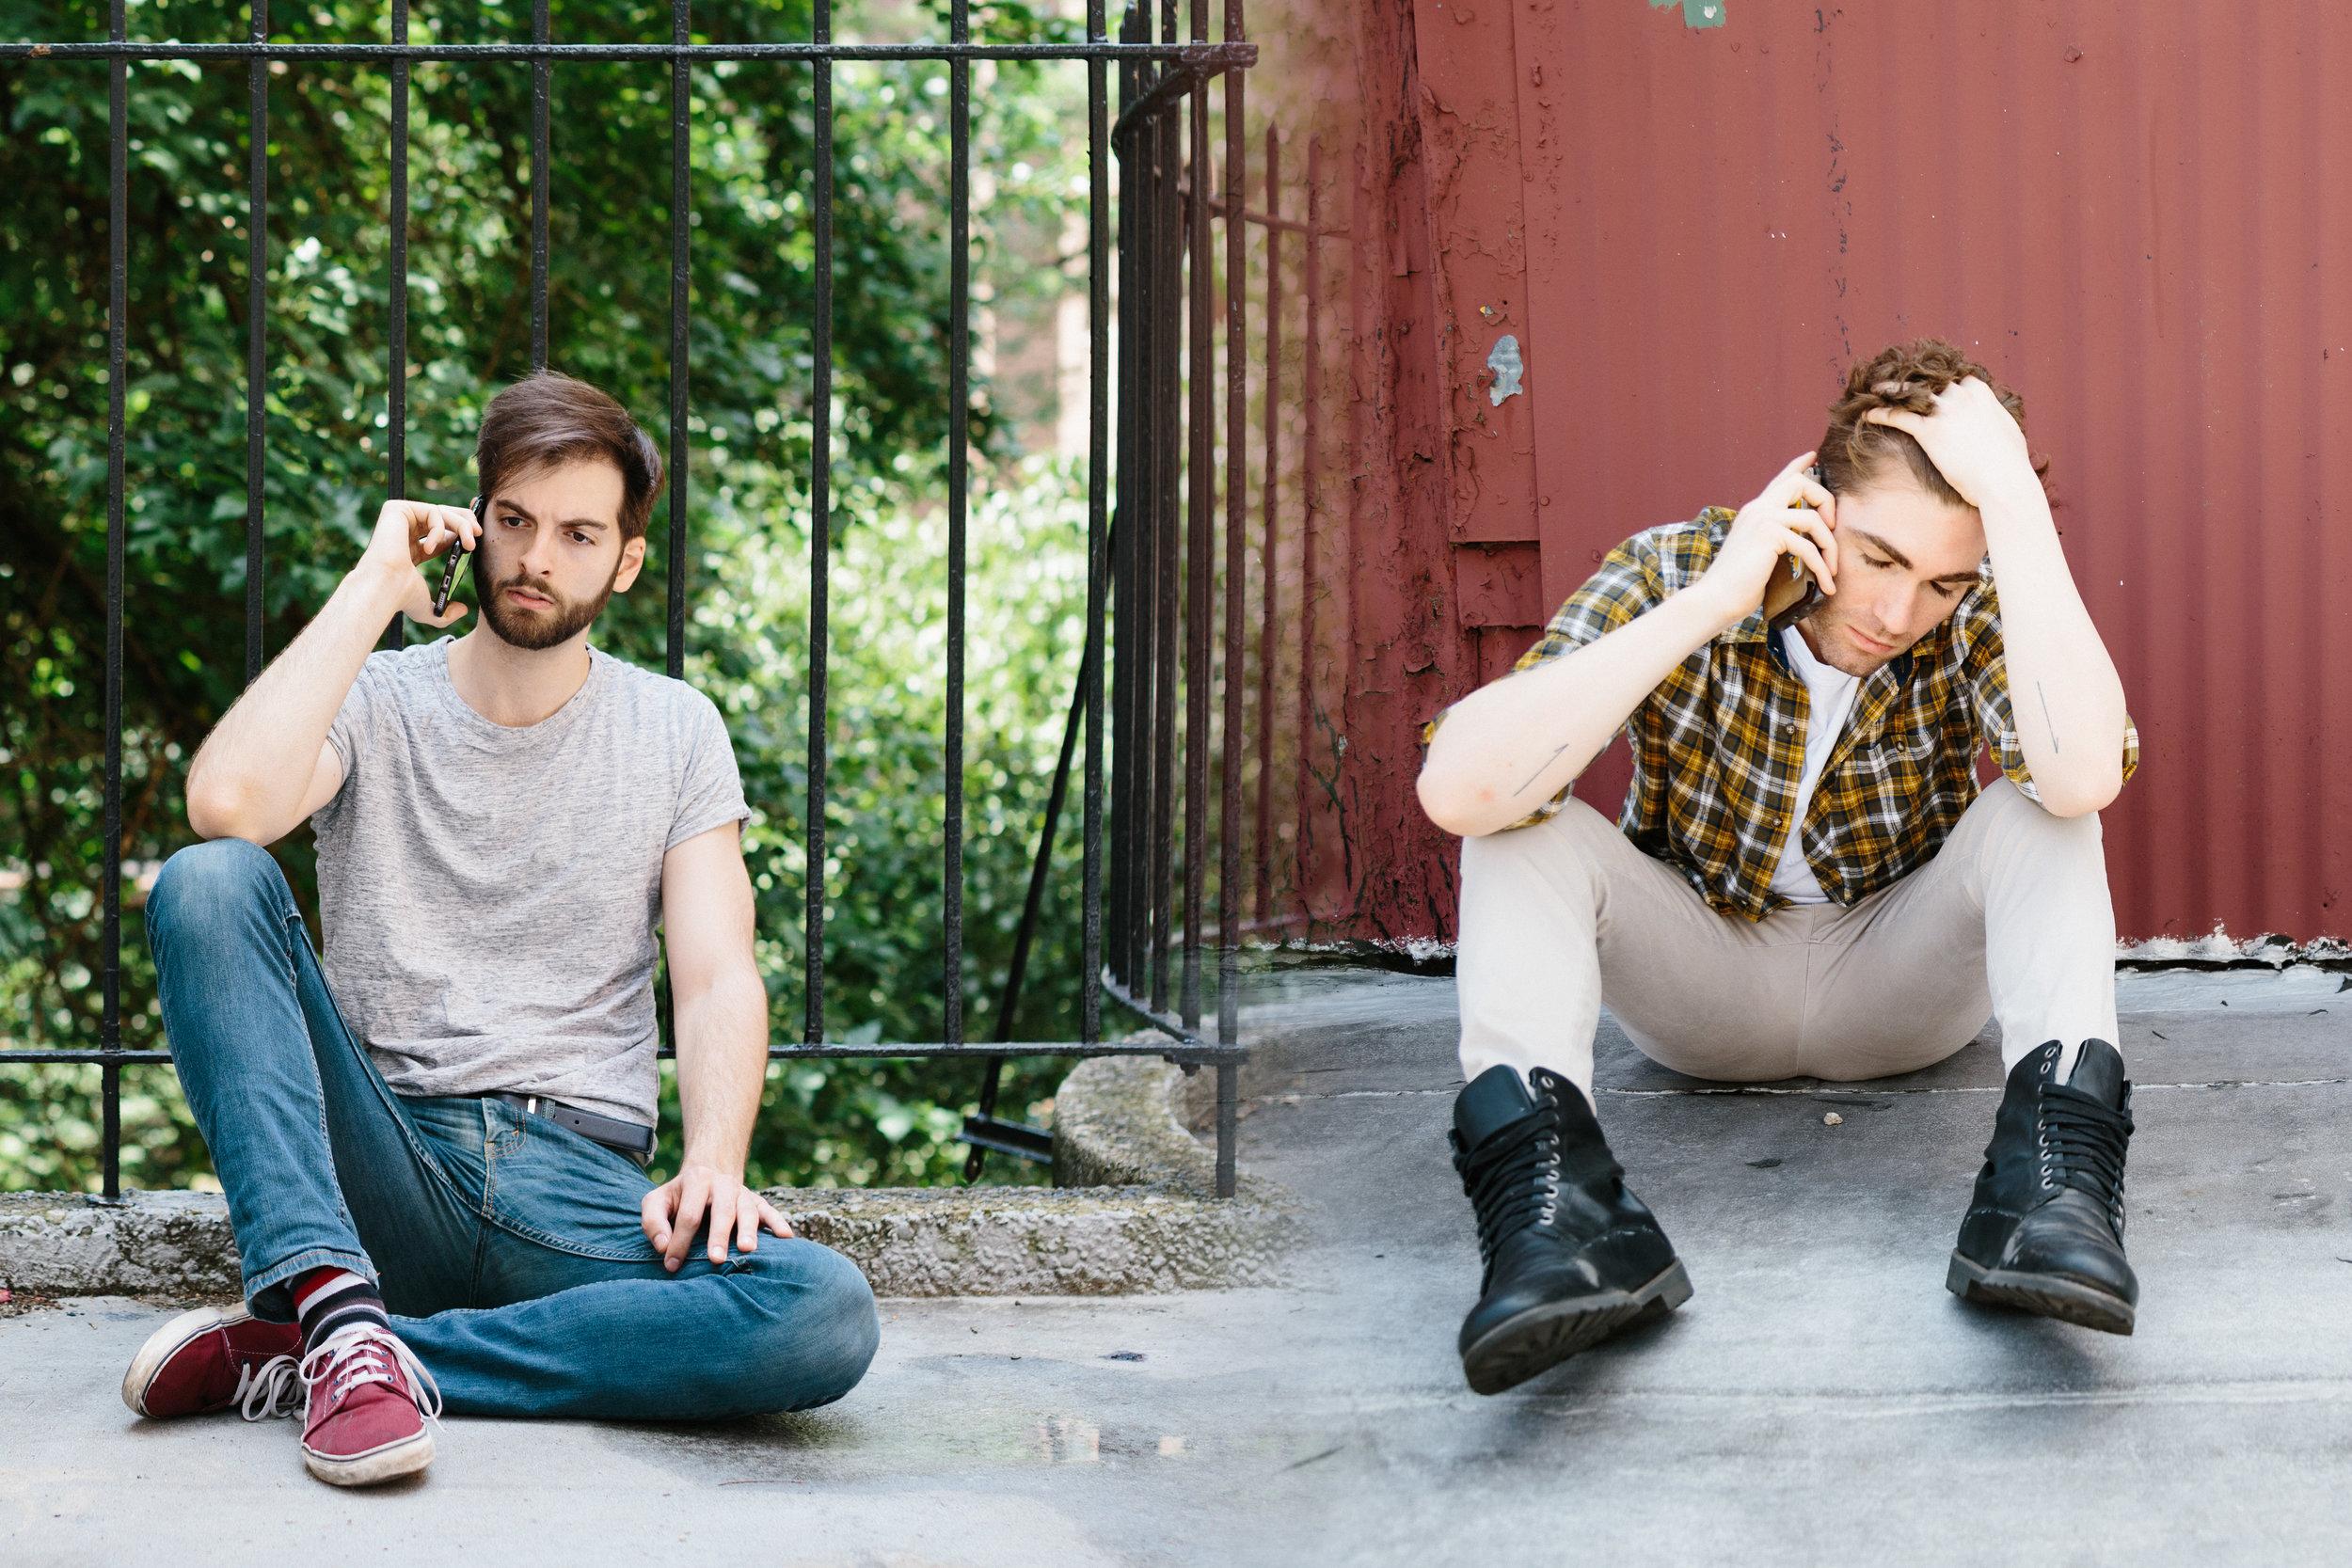 Last Ditch Playlist Promo, with Ross McCorkell (photo by Joseph Prestamo)